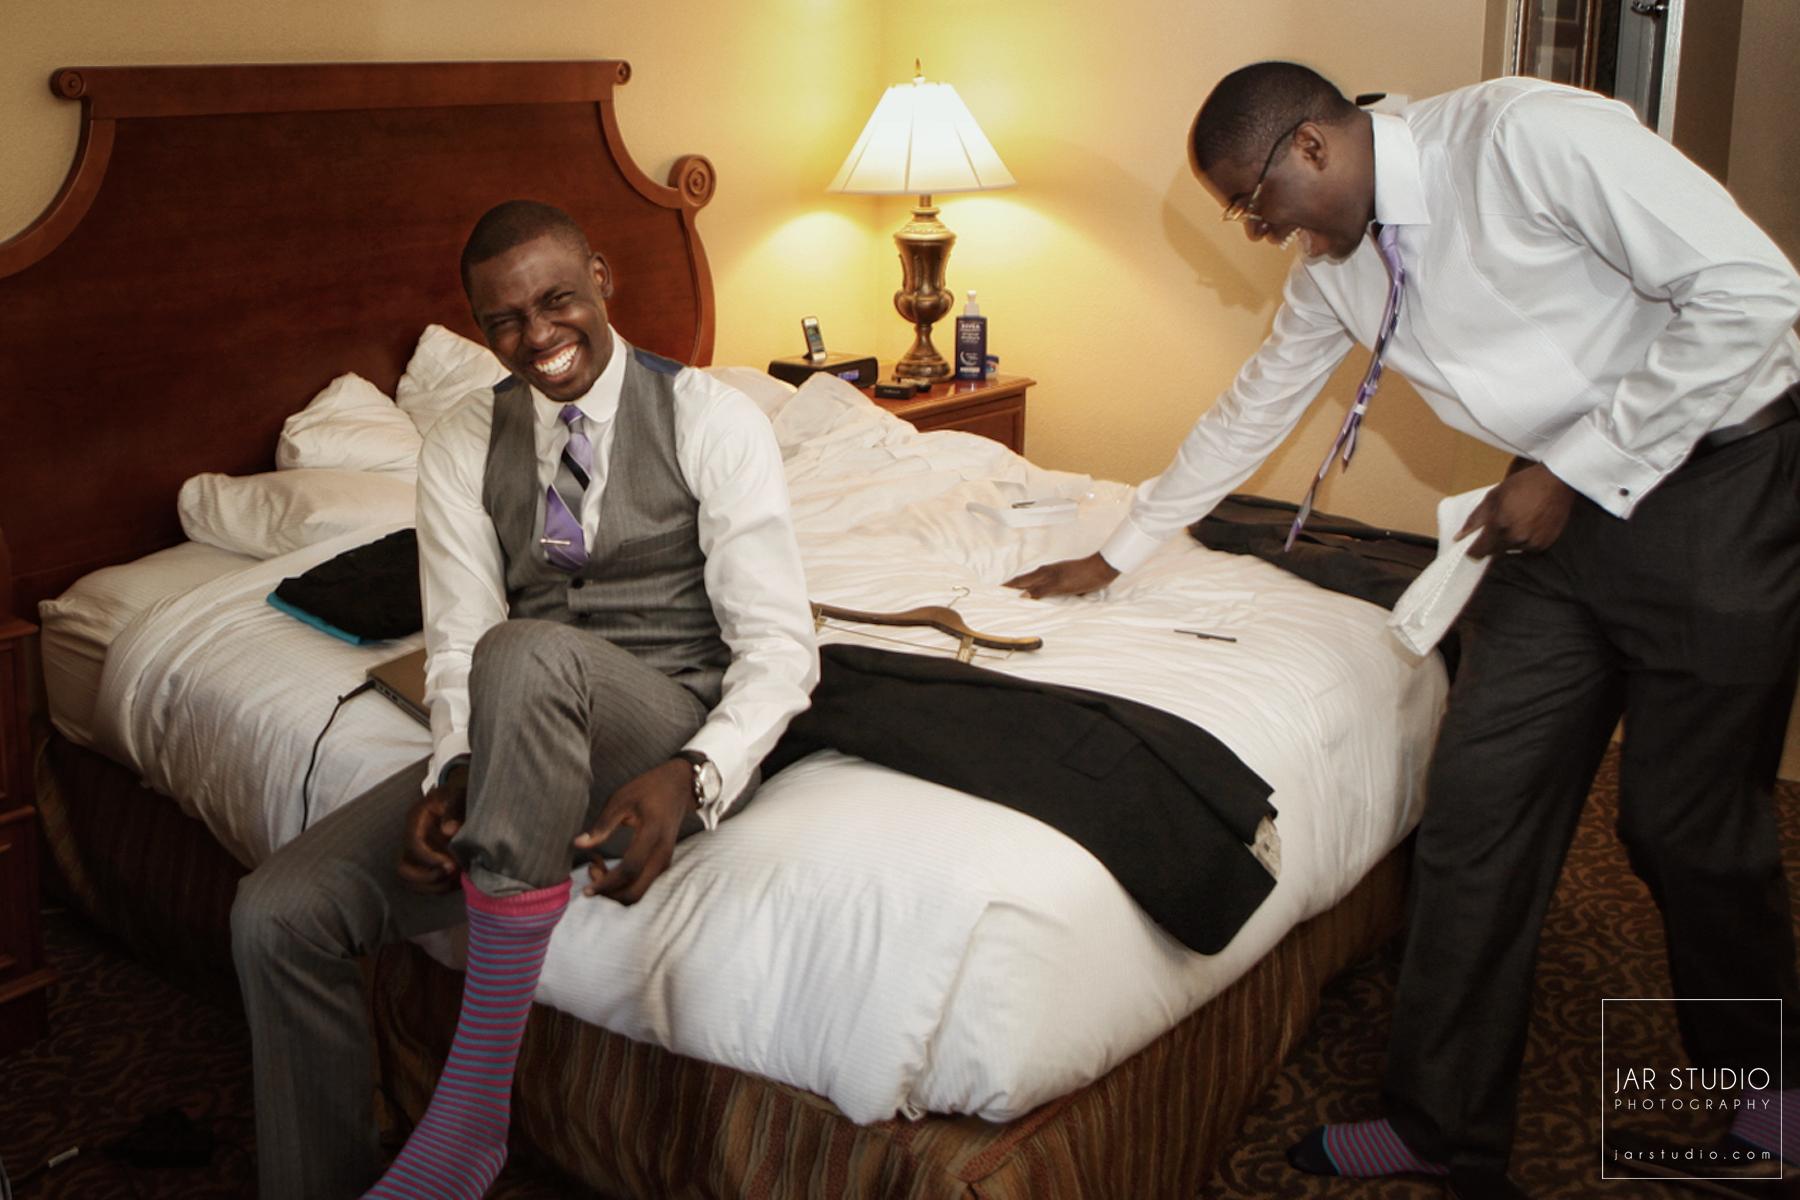 06-nigerian-groom-groomsmen-getting-ready-orlando-resort-jarstudio-photography.JPG